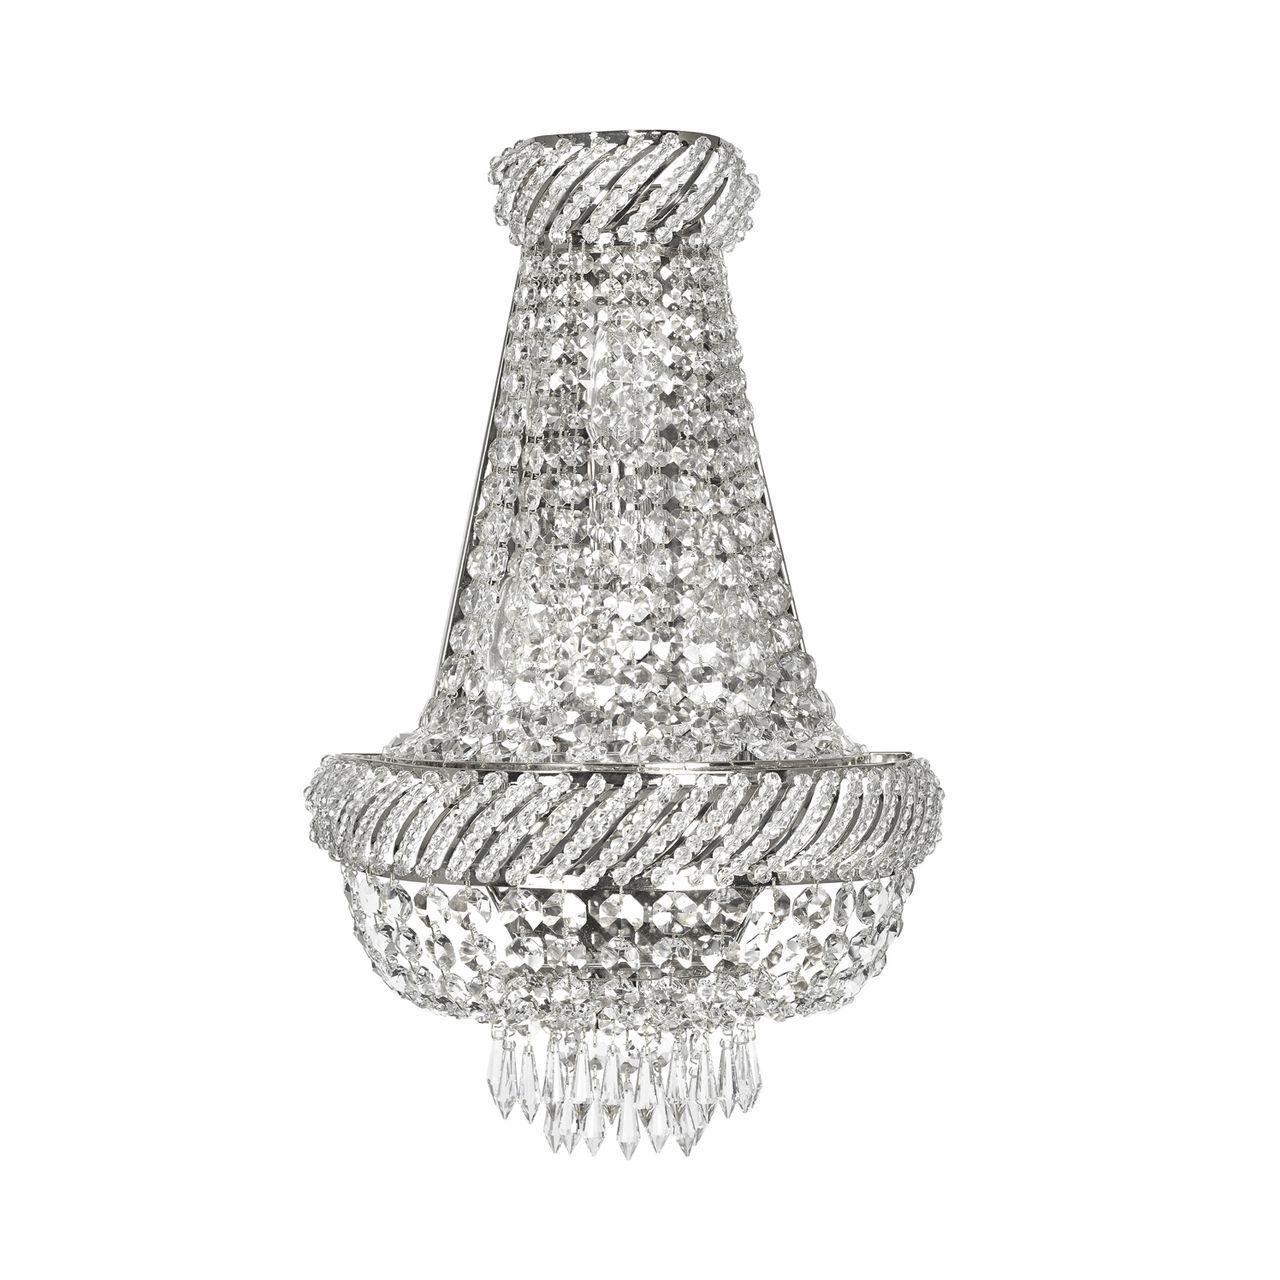 Настенный светильник Dio DArte Asfour Bari E 2.20.200 N